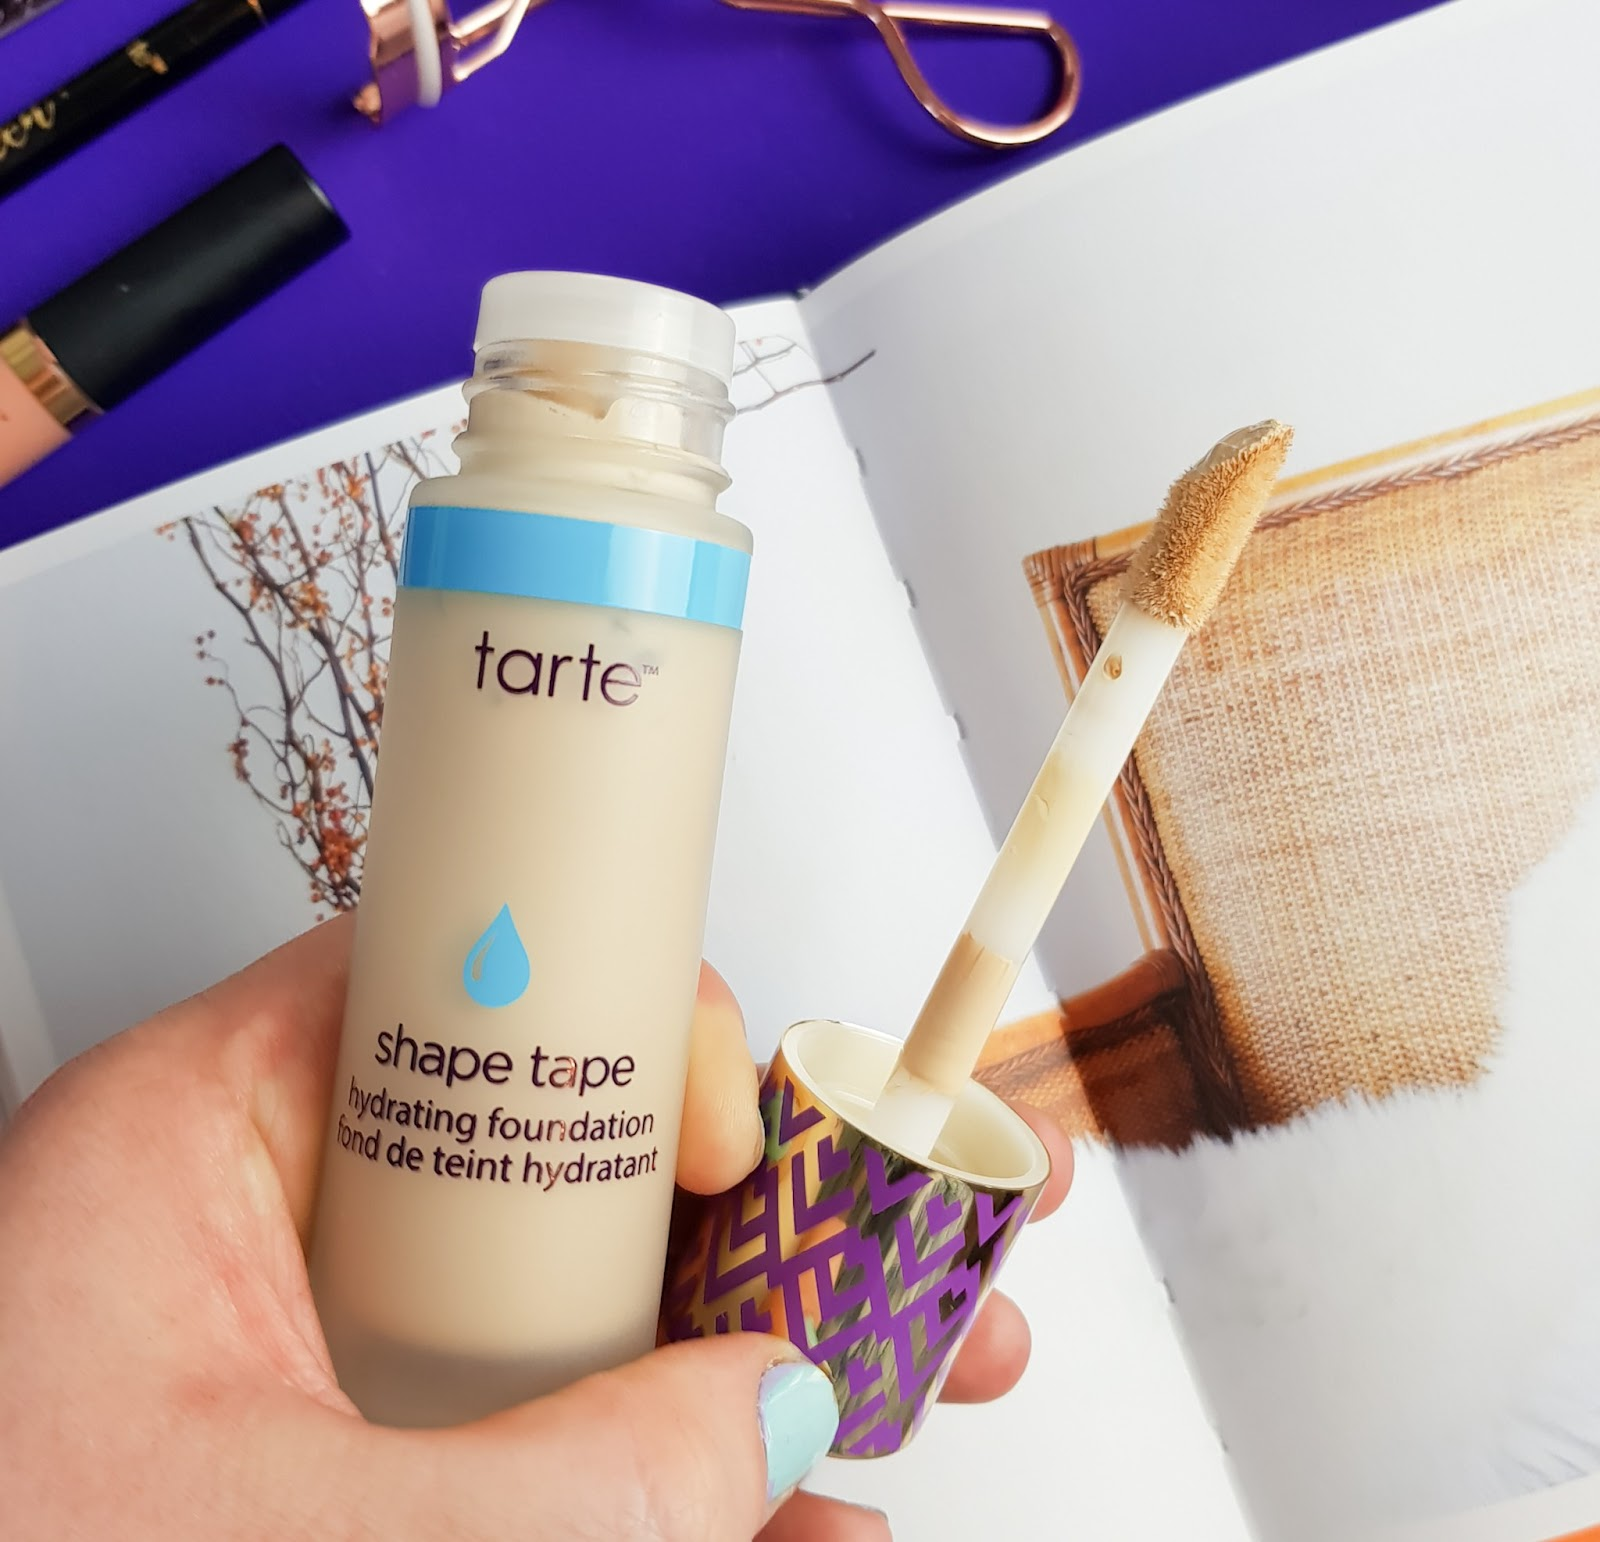 Tarte Make Up Shape Tape Hydrating Foundation